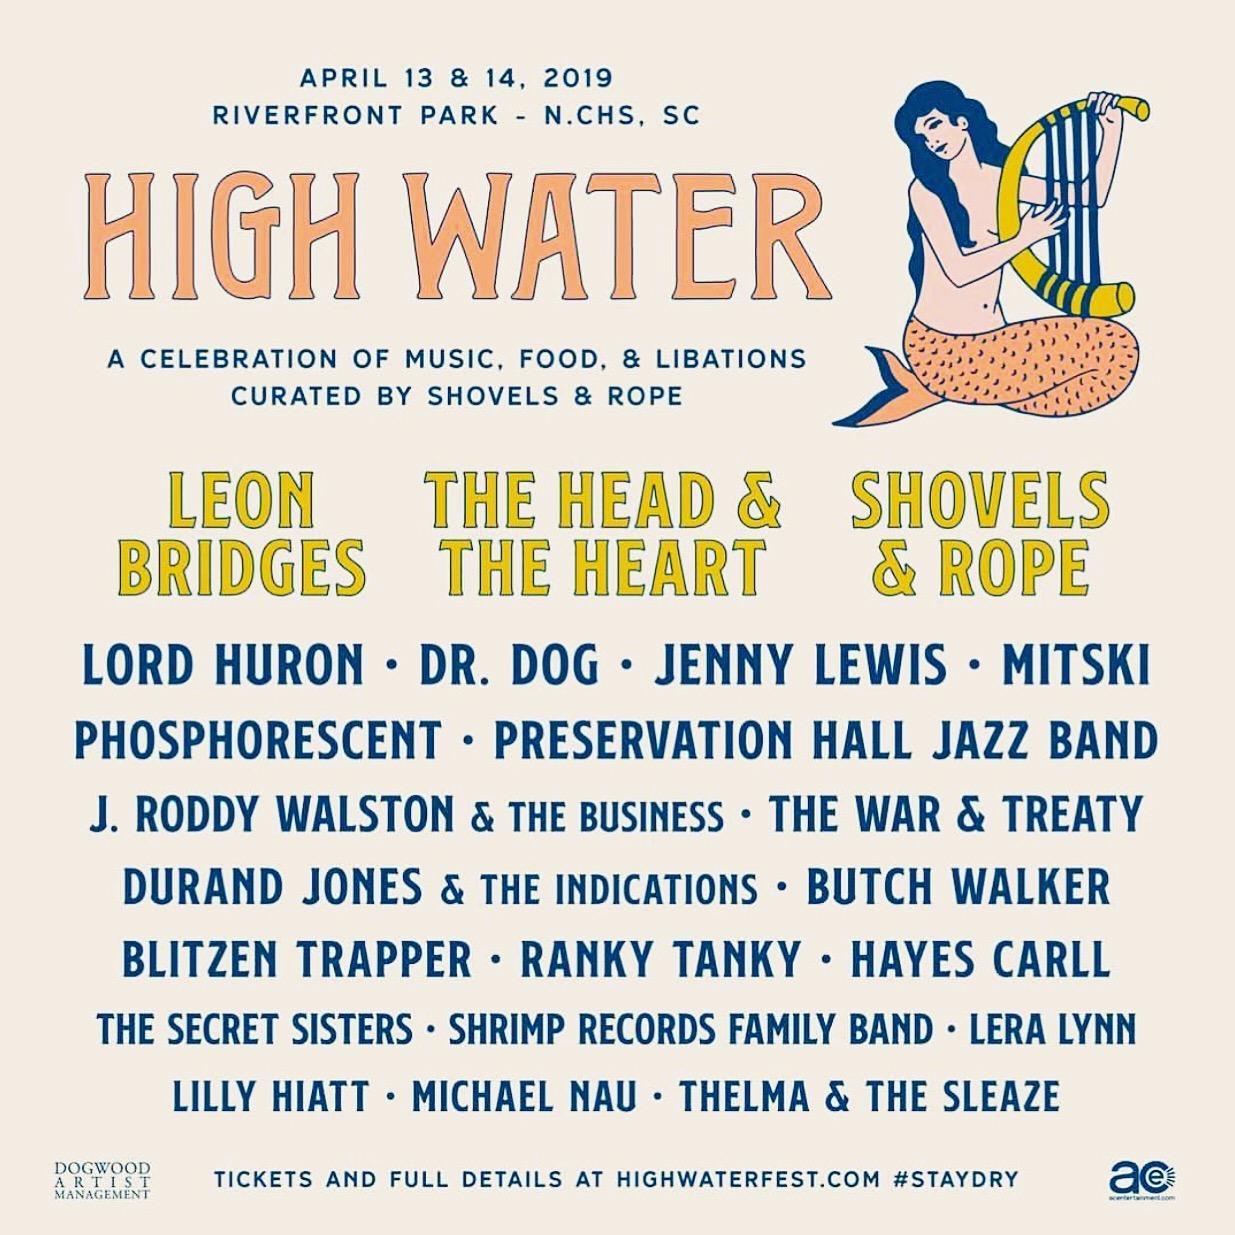 05 High Water Lineup.JPG